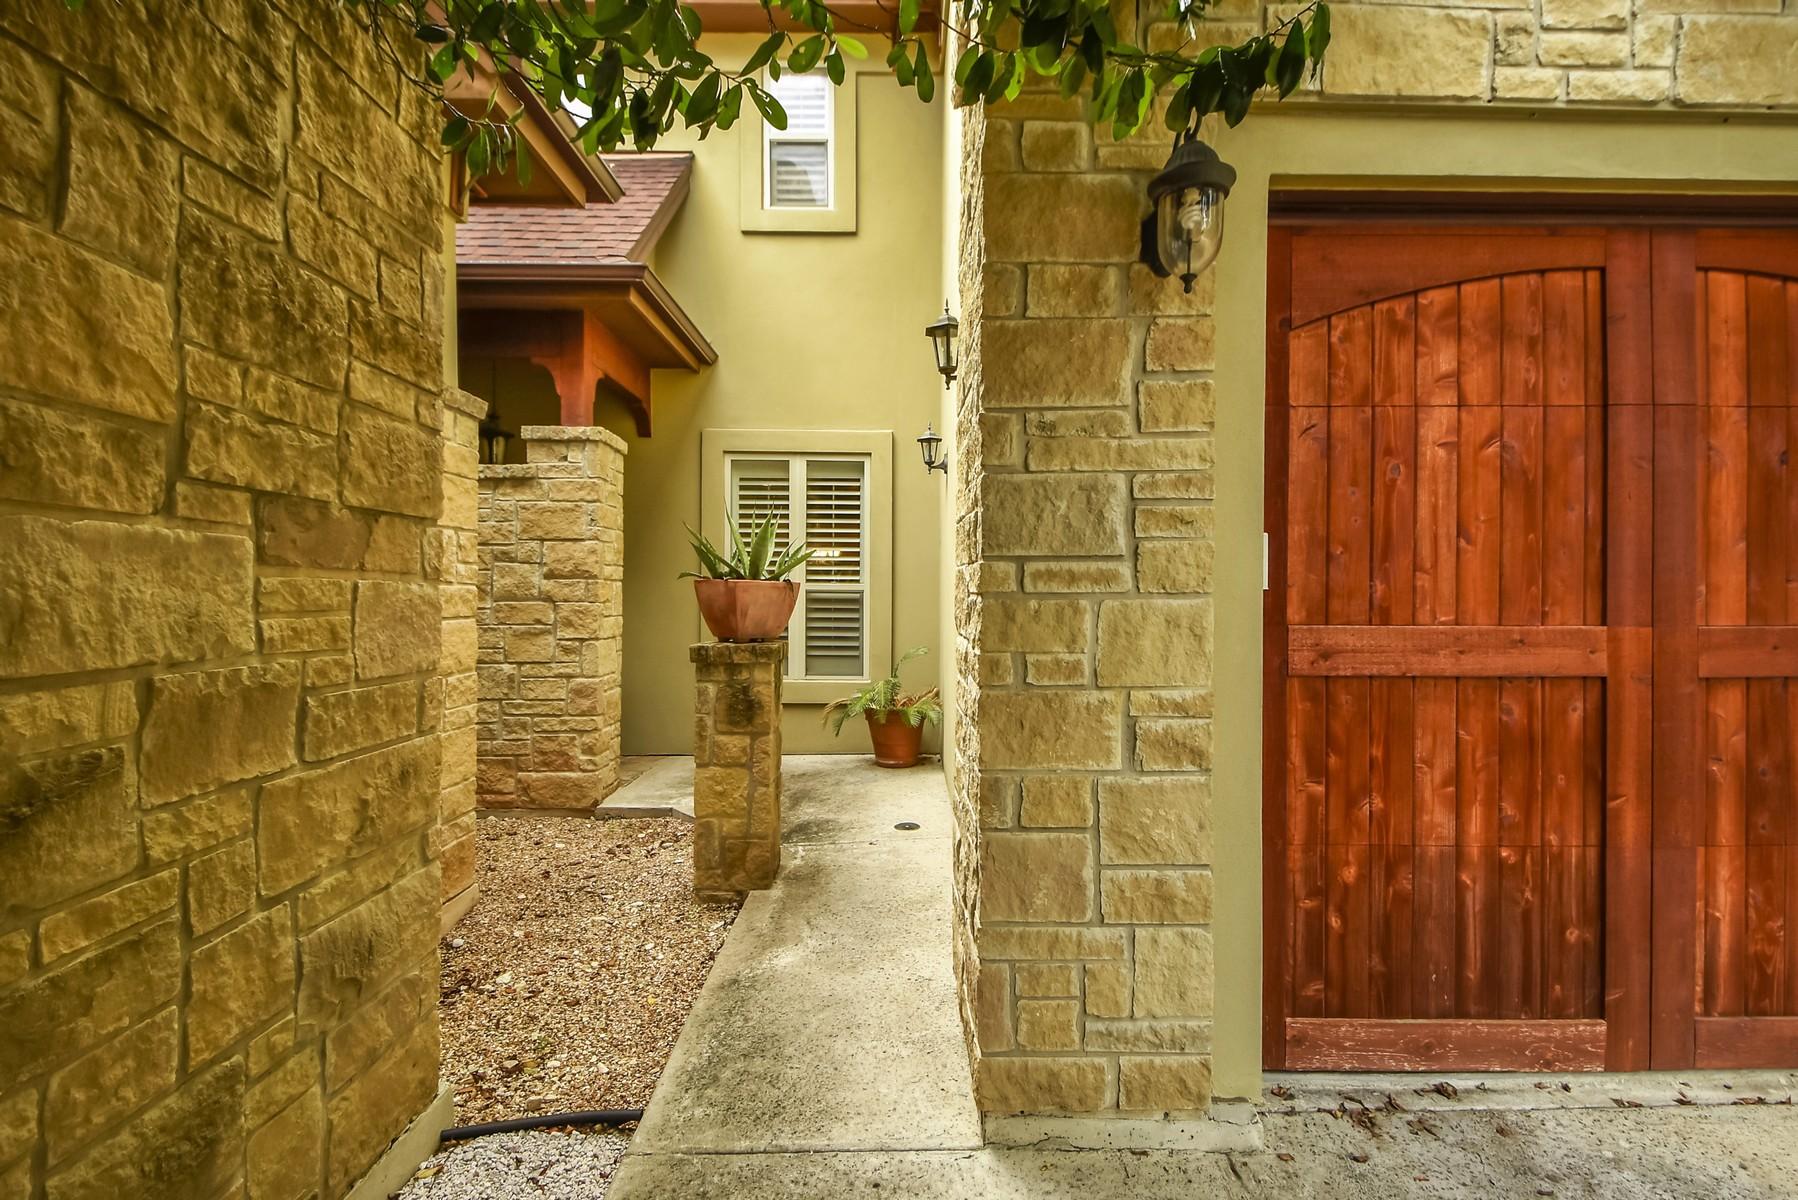 Condominium for Sale at Fabulous Jim Hogg Condo 5600 Jim Hogg Ave B Austin, Texas 78756 United States